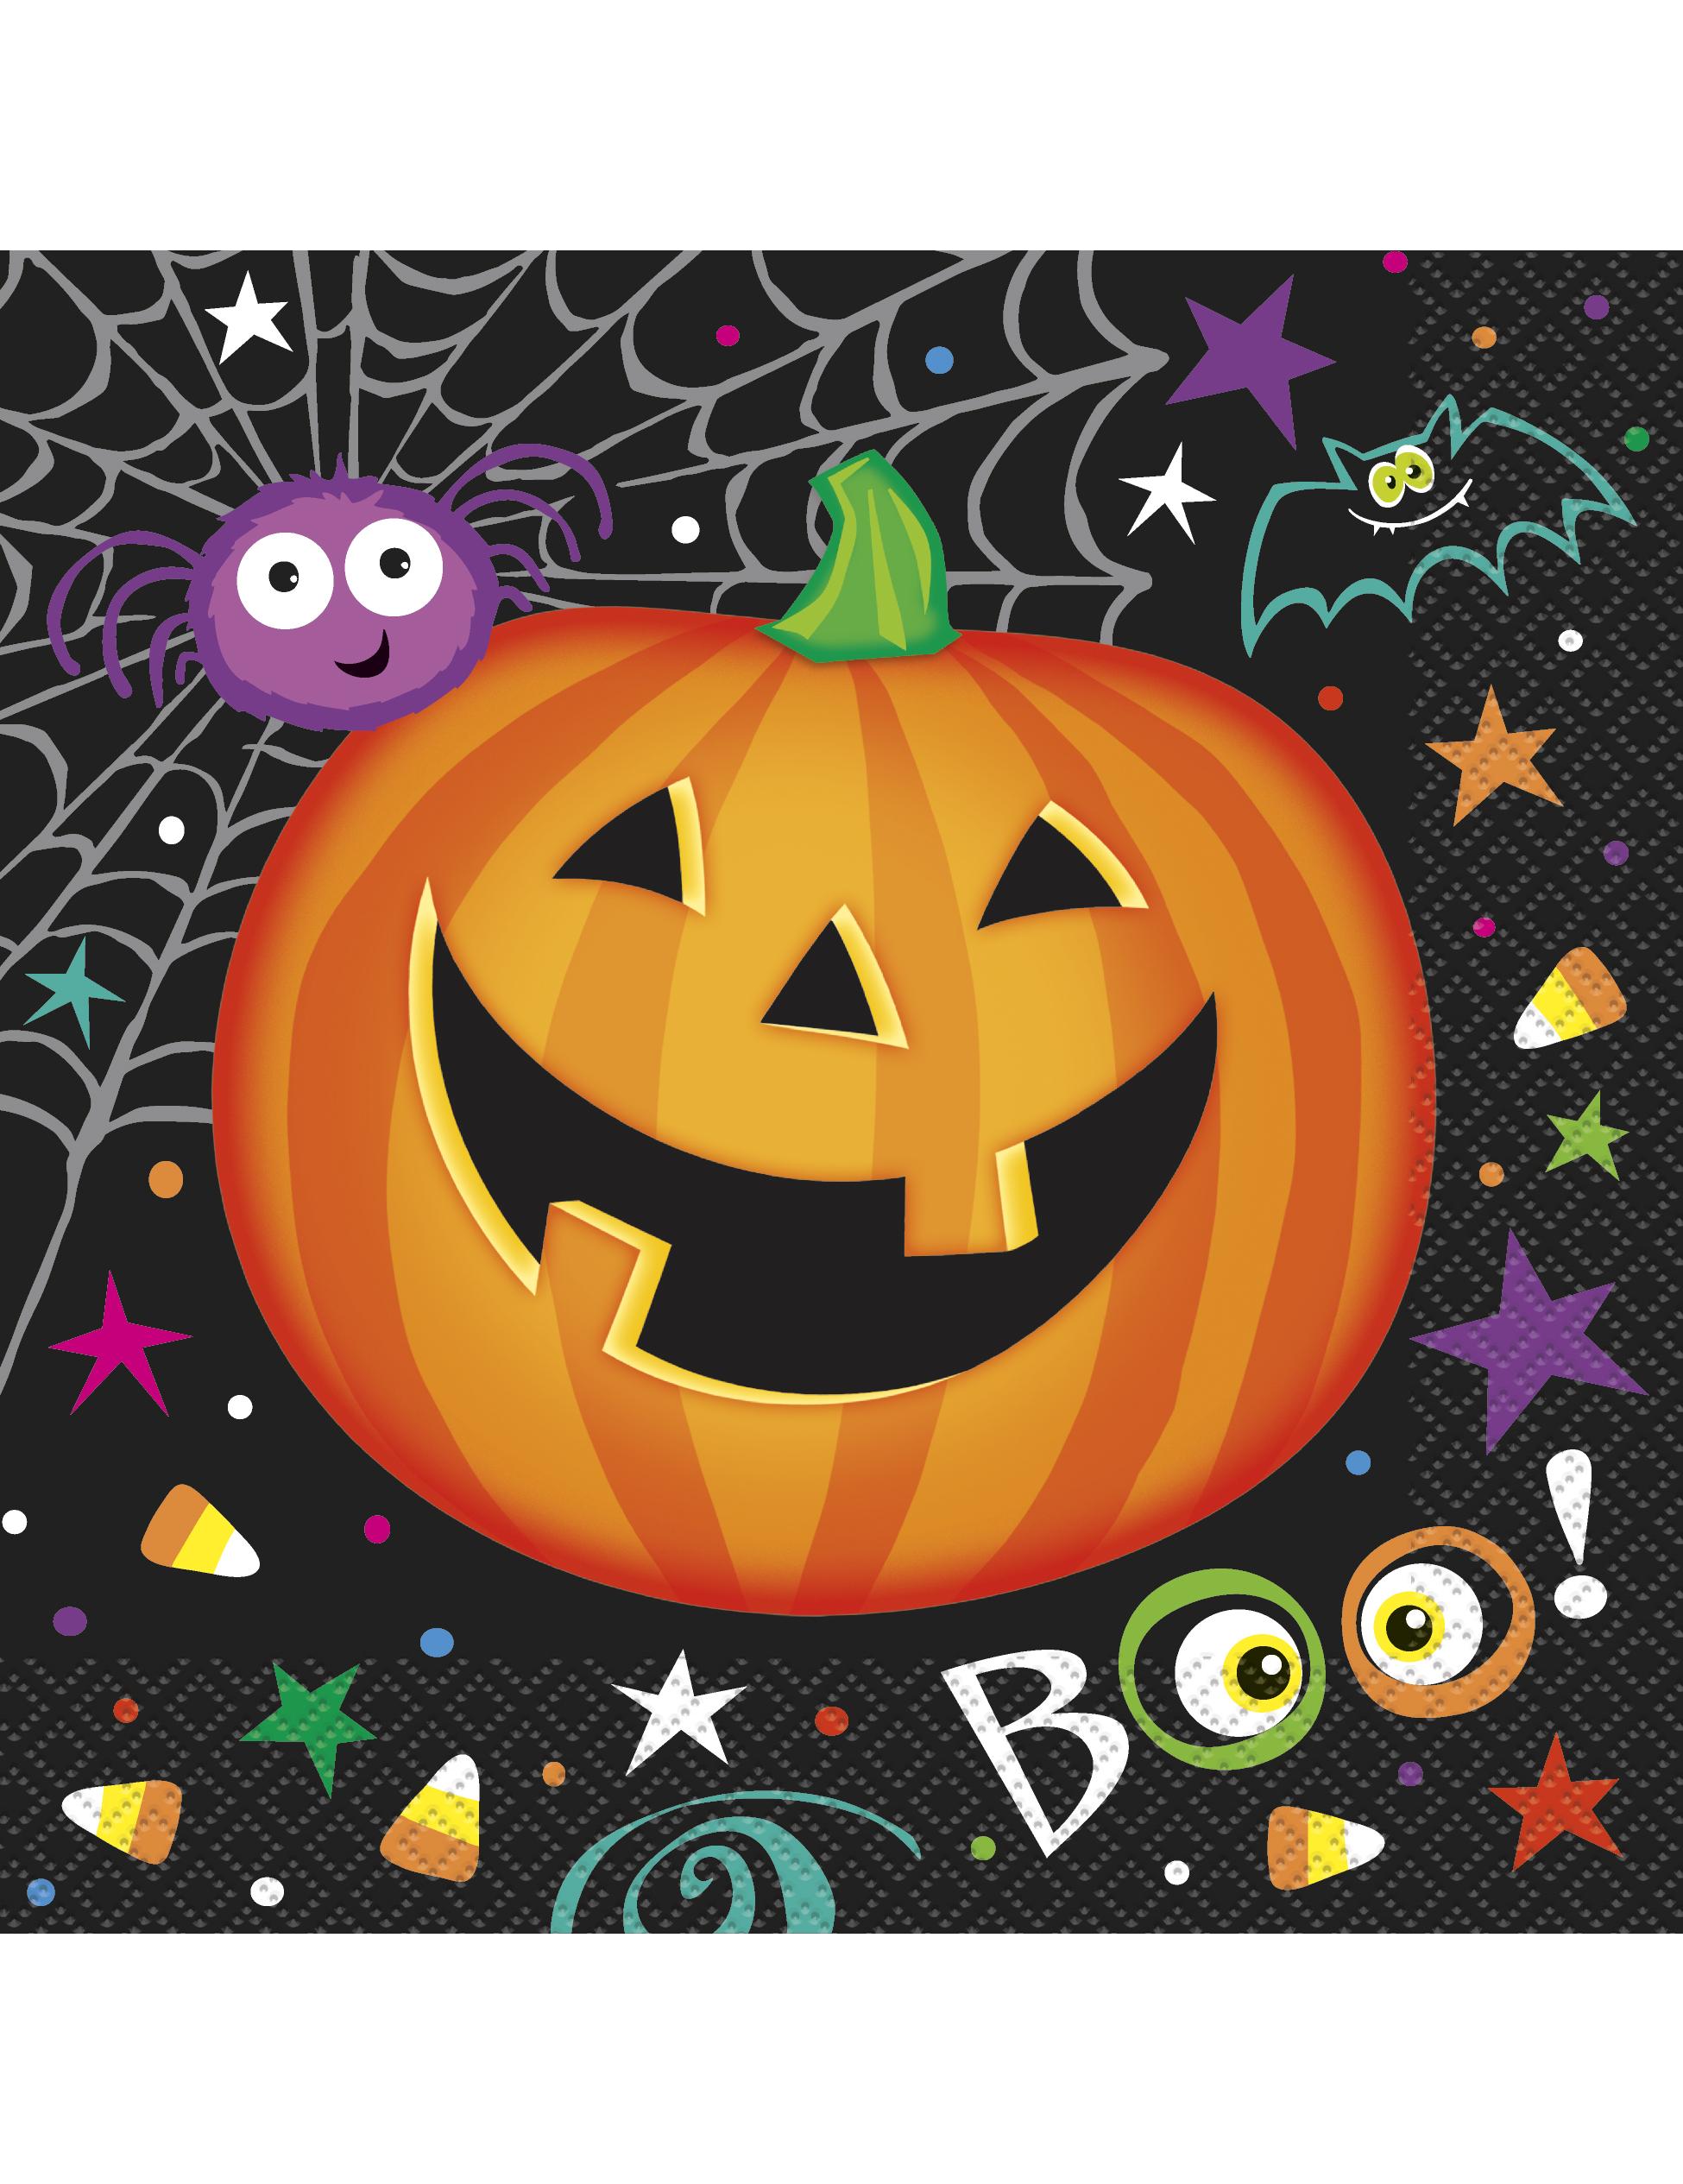 16 tovaglioli di carta zucca halloween addobbi e vestiti di carnevale online vegaoo - Tovaglioli di carta decorati ...